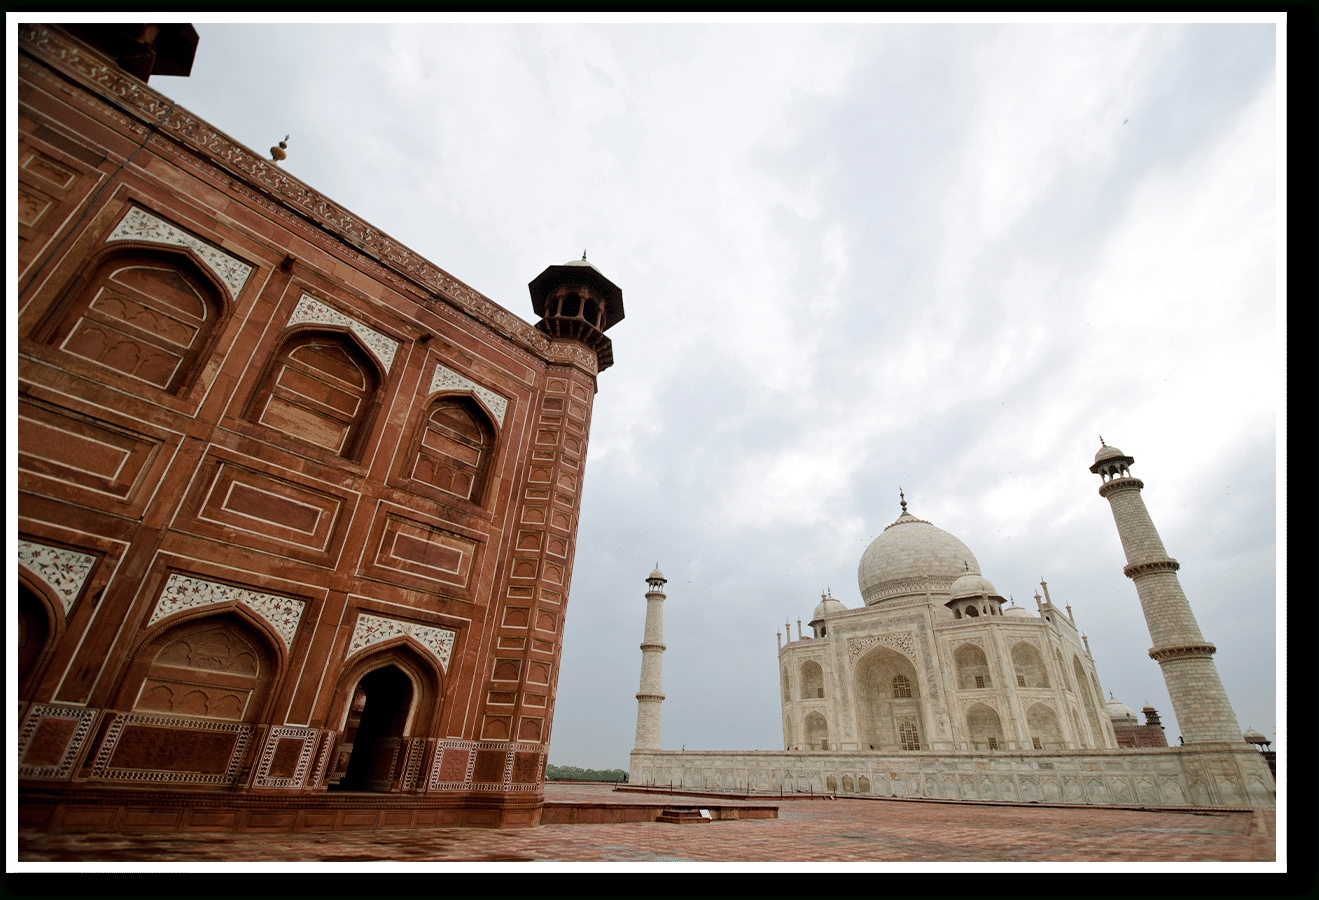 Dailyobjects Taj Mahal Perspective Small Wall Art Print Small Pertaining To 2017 Taj Mahal Wall Art (View 11 of 25)